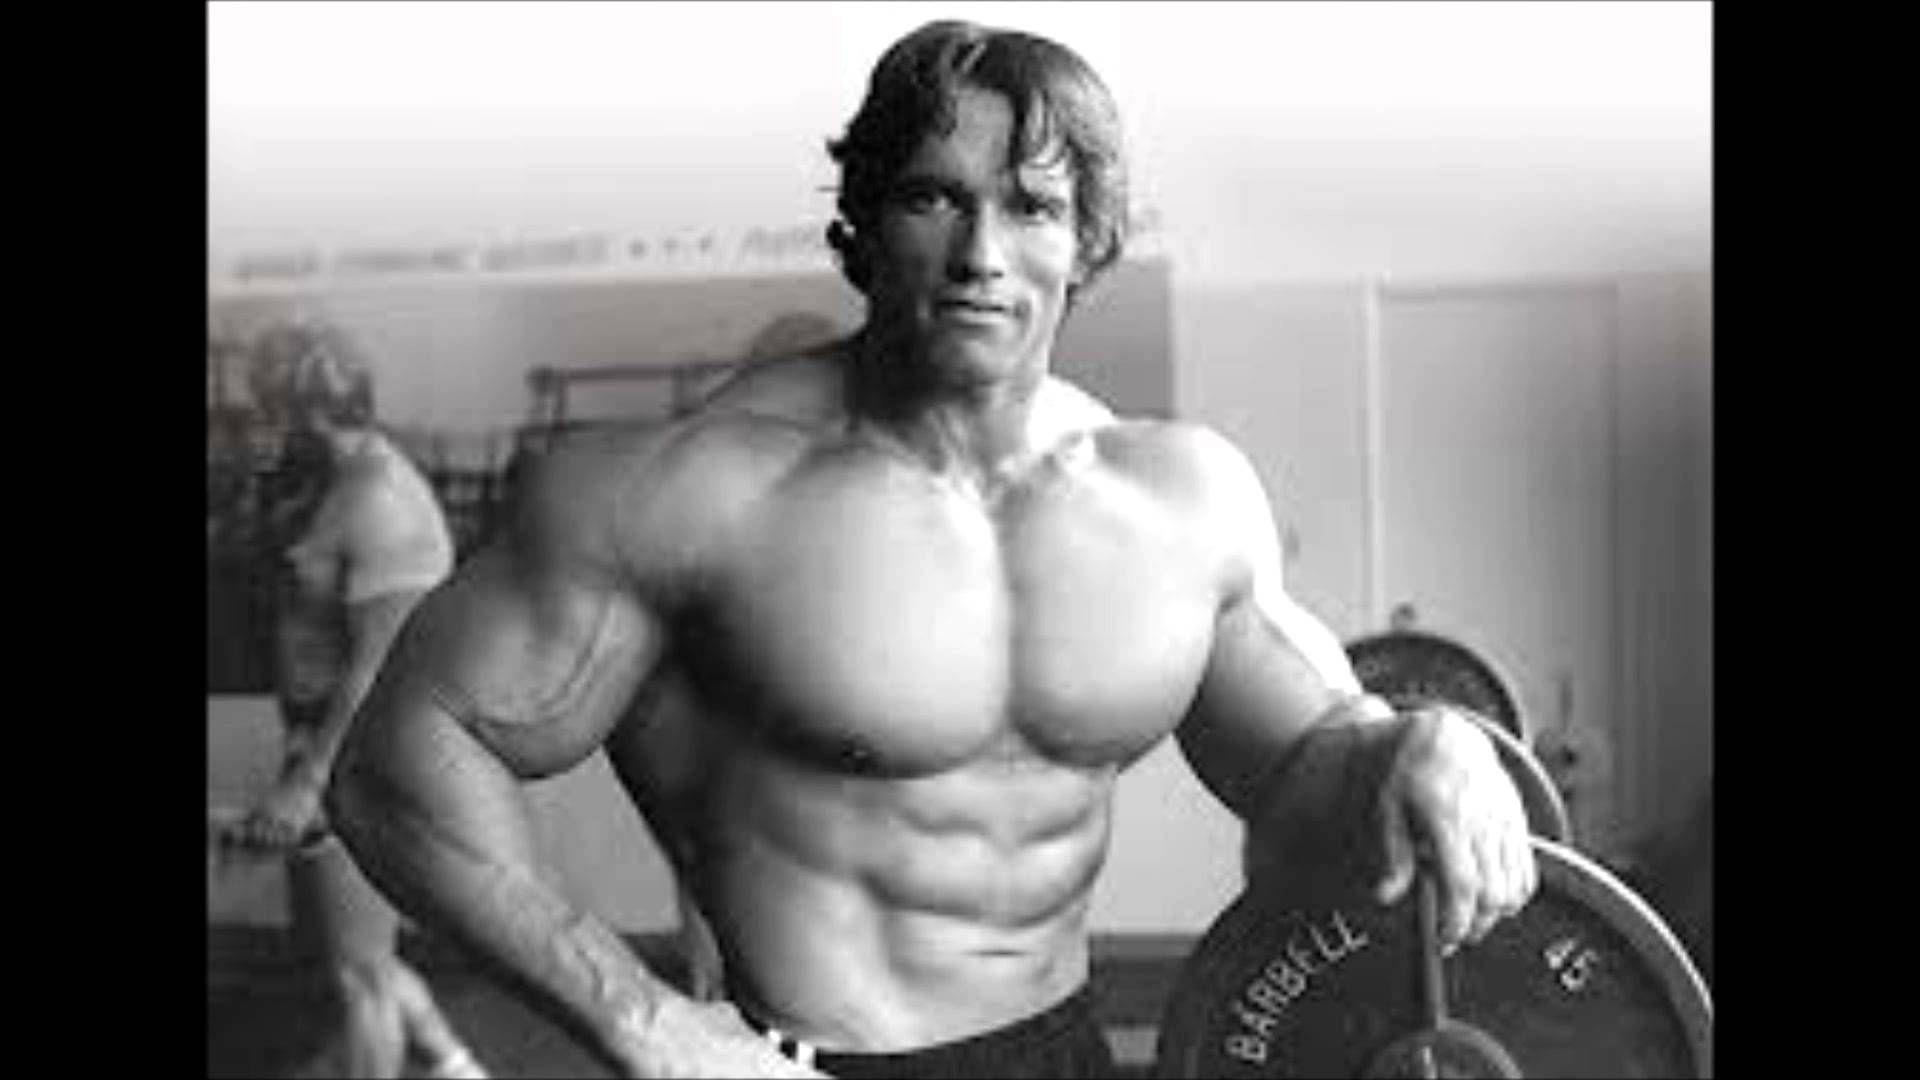 Arnold schwarzenegger bodybuilding motivation hd images 3 hd arnold schwarzenegger bodybuilding motivation hd images 3 hd wallpapers voltagebd Images